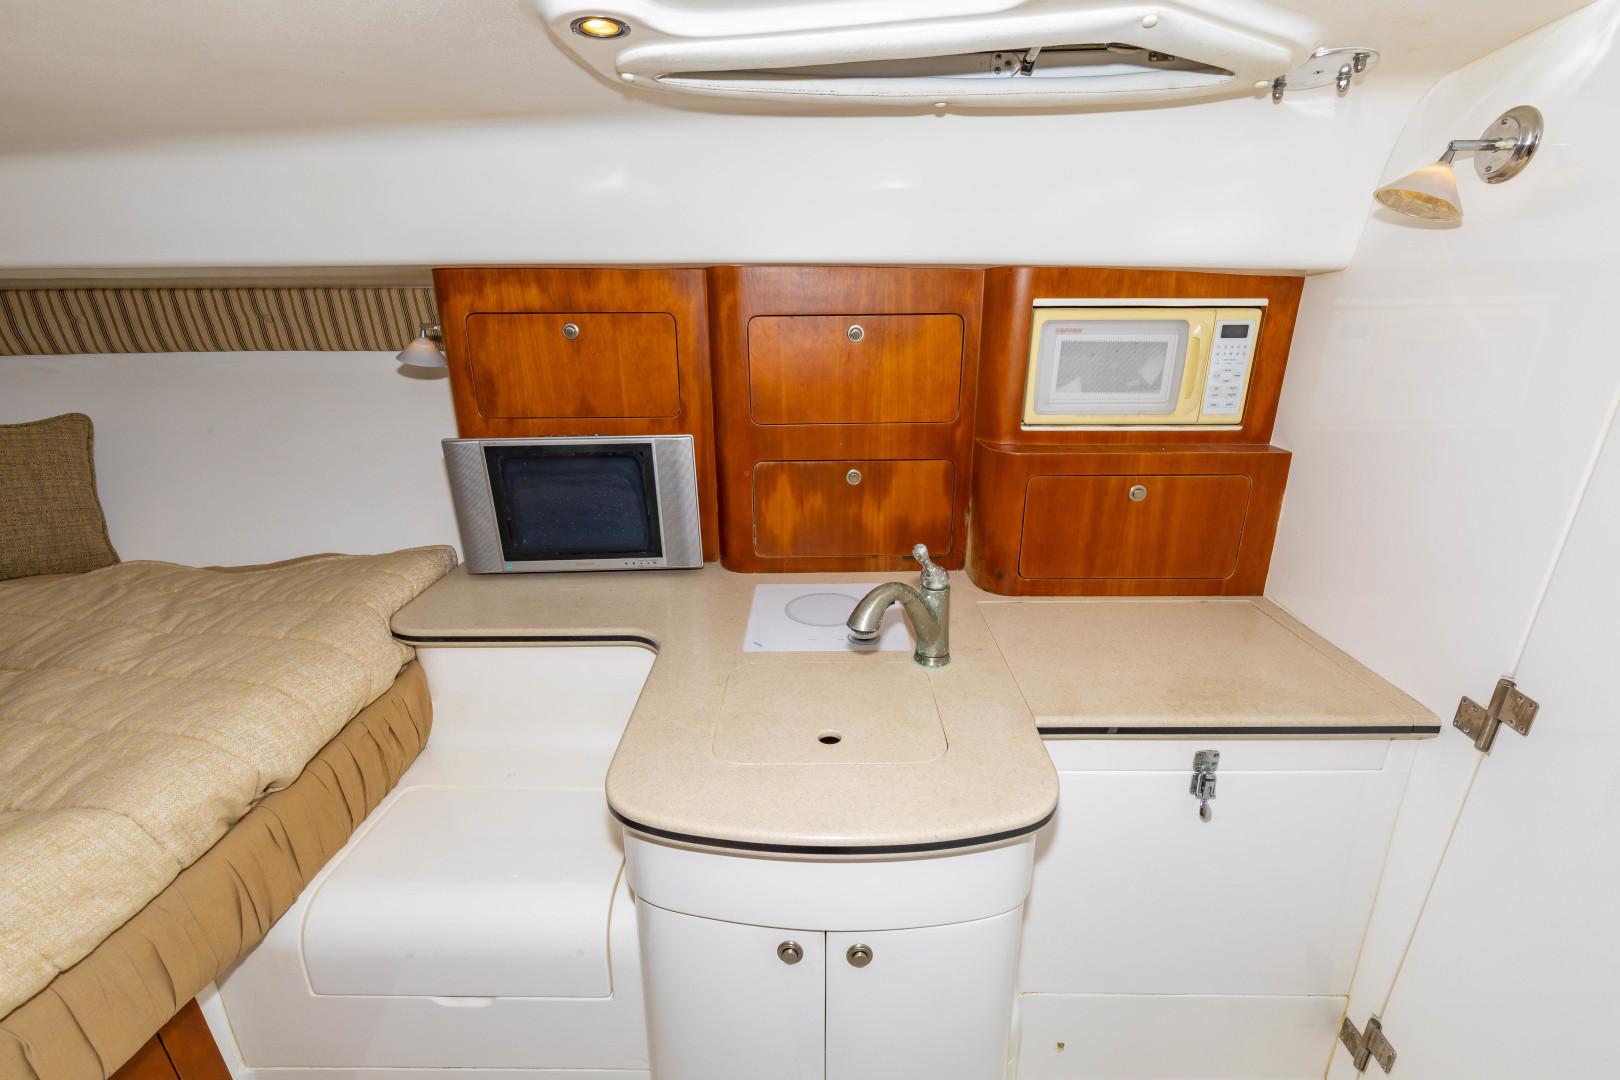 Intrepid-377 Walkaround 2005-Rock Boat REFIT 2018 Dania Beach-Florida-United States-377 Intrepid Galley 2-1511542 | Thumbnail